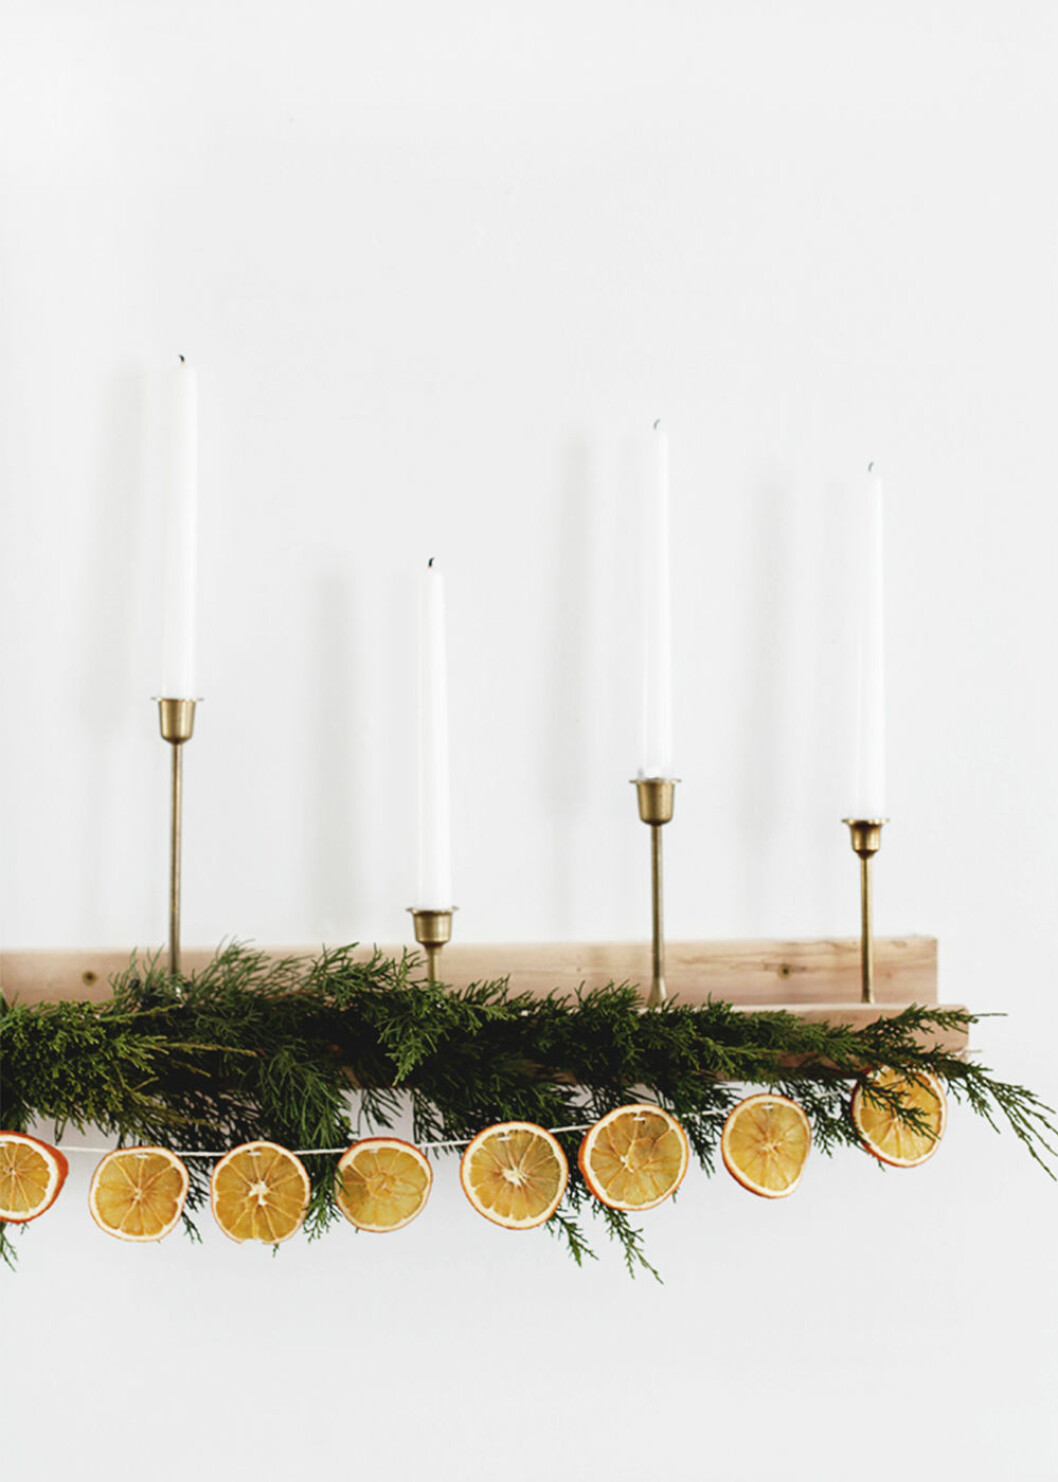 Enkelt DIY julpynt med apelsinskivor